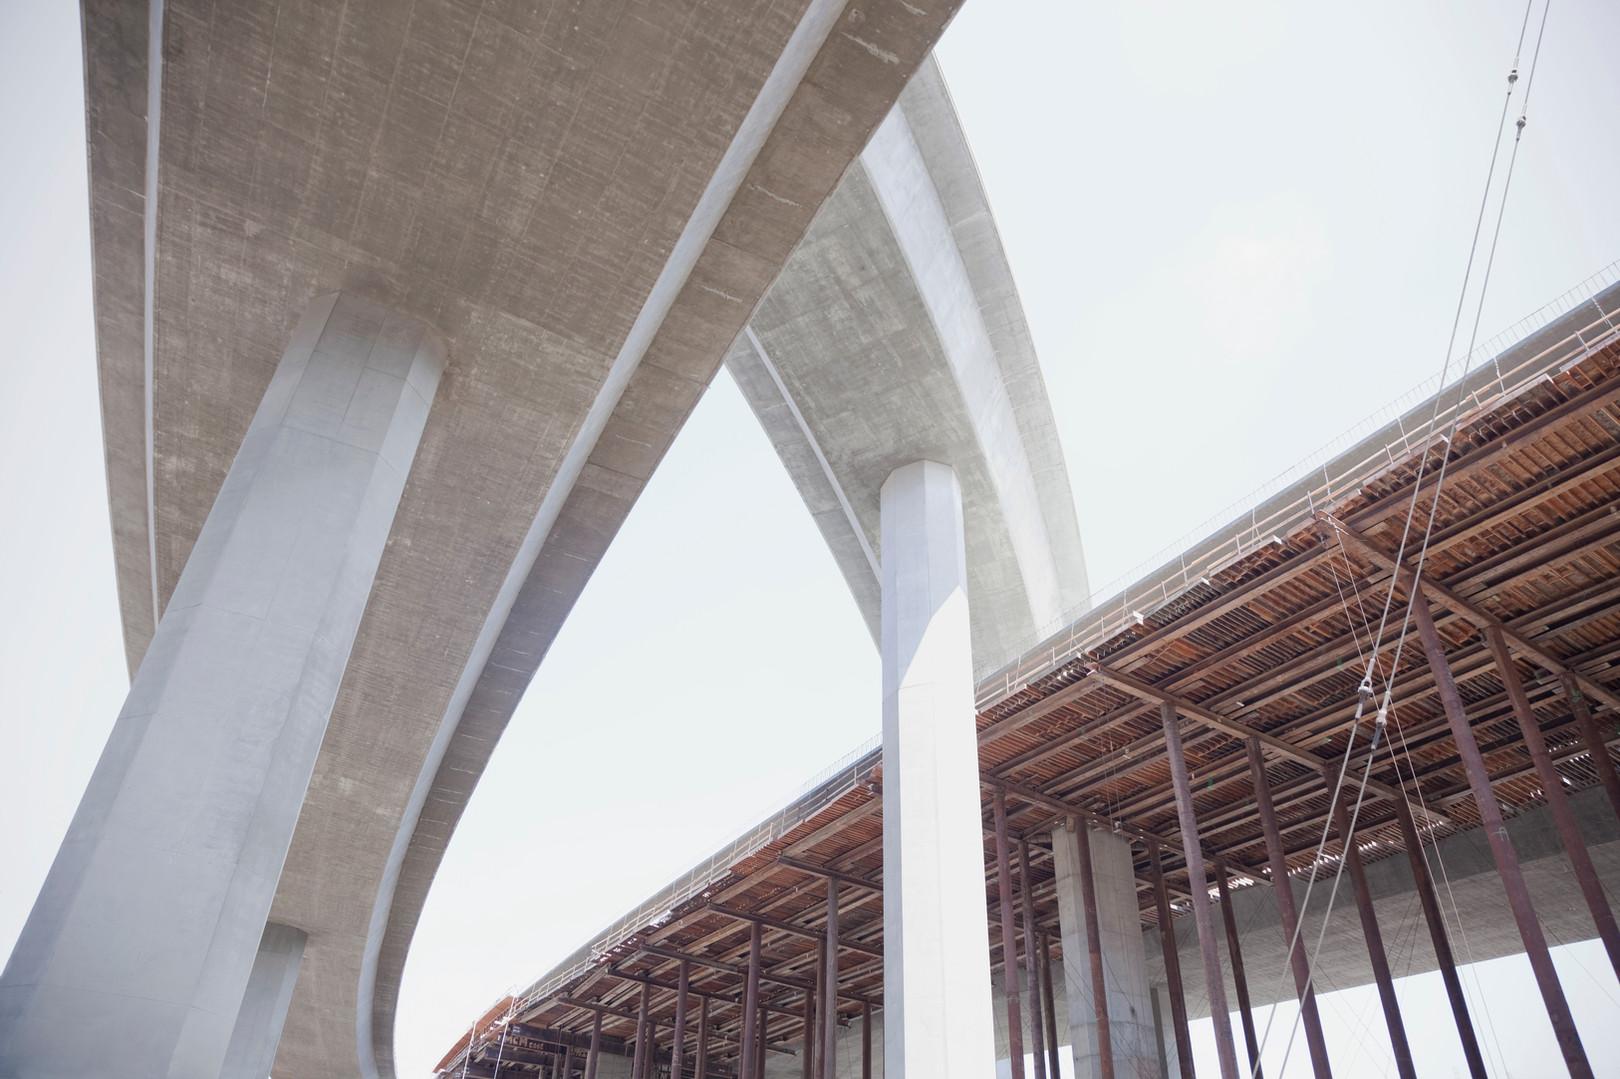 Concrete Bridge Intersection